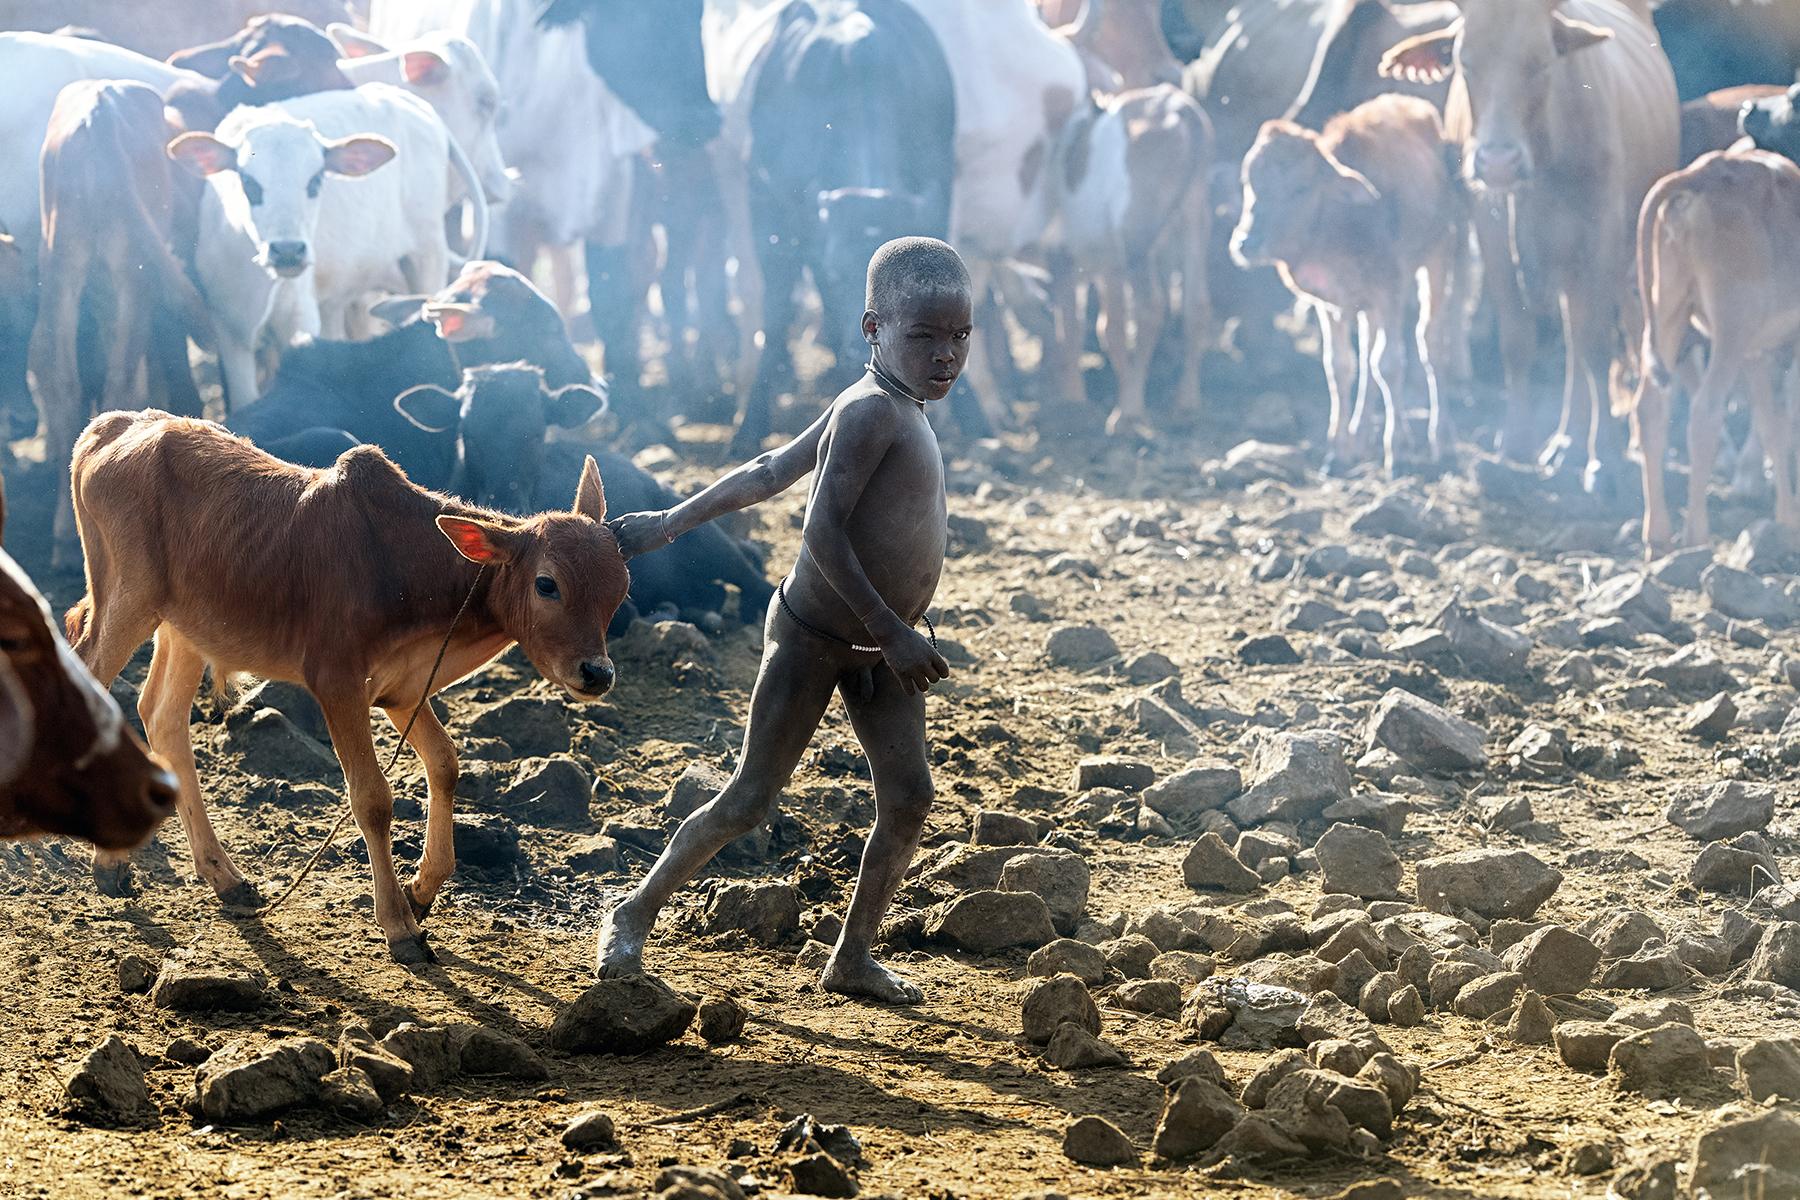 David Nam Lip_LEE_The Ritual Belong To The Suri Tribe Of Ethiopia_Suri Cow Boy_6.jpg